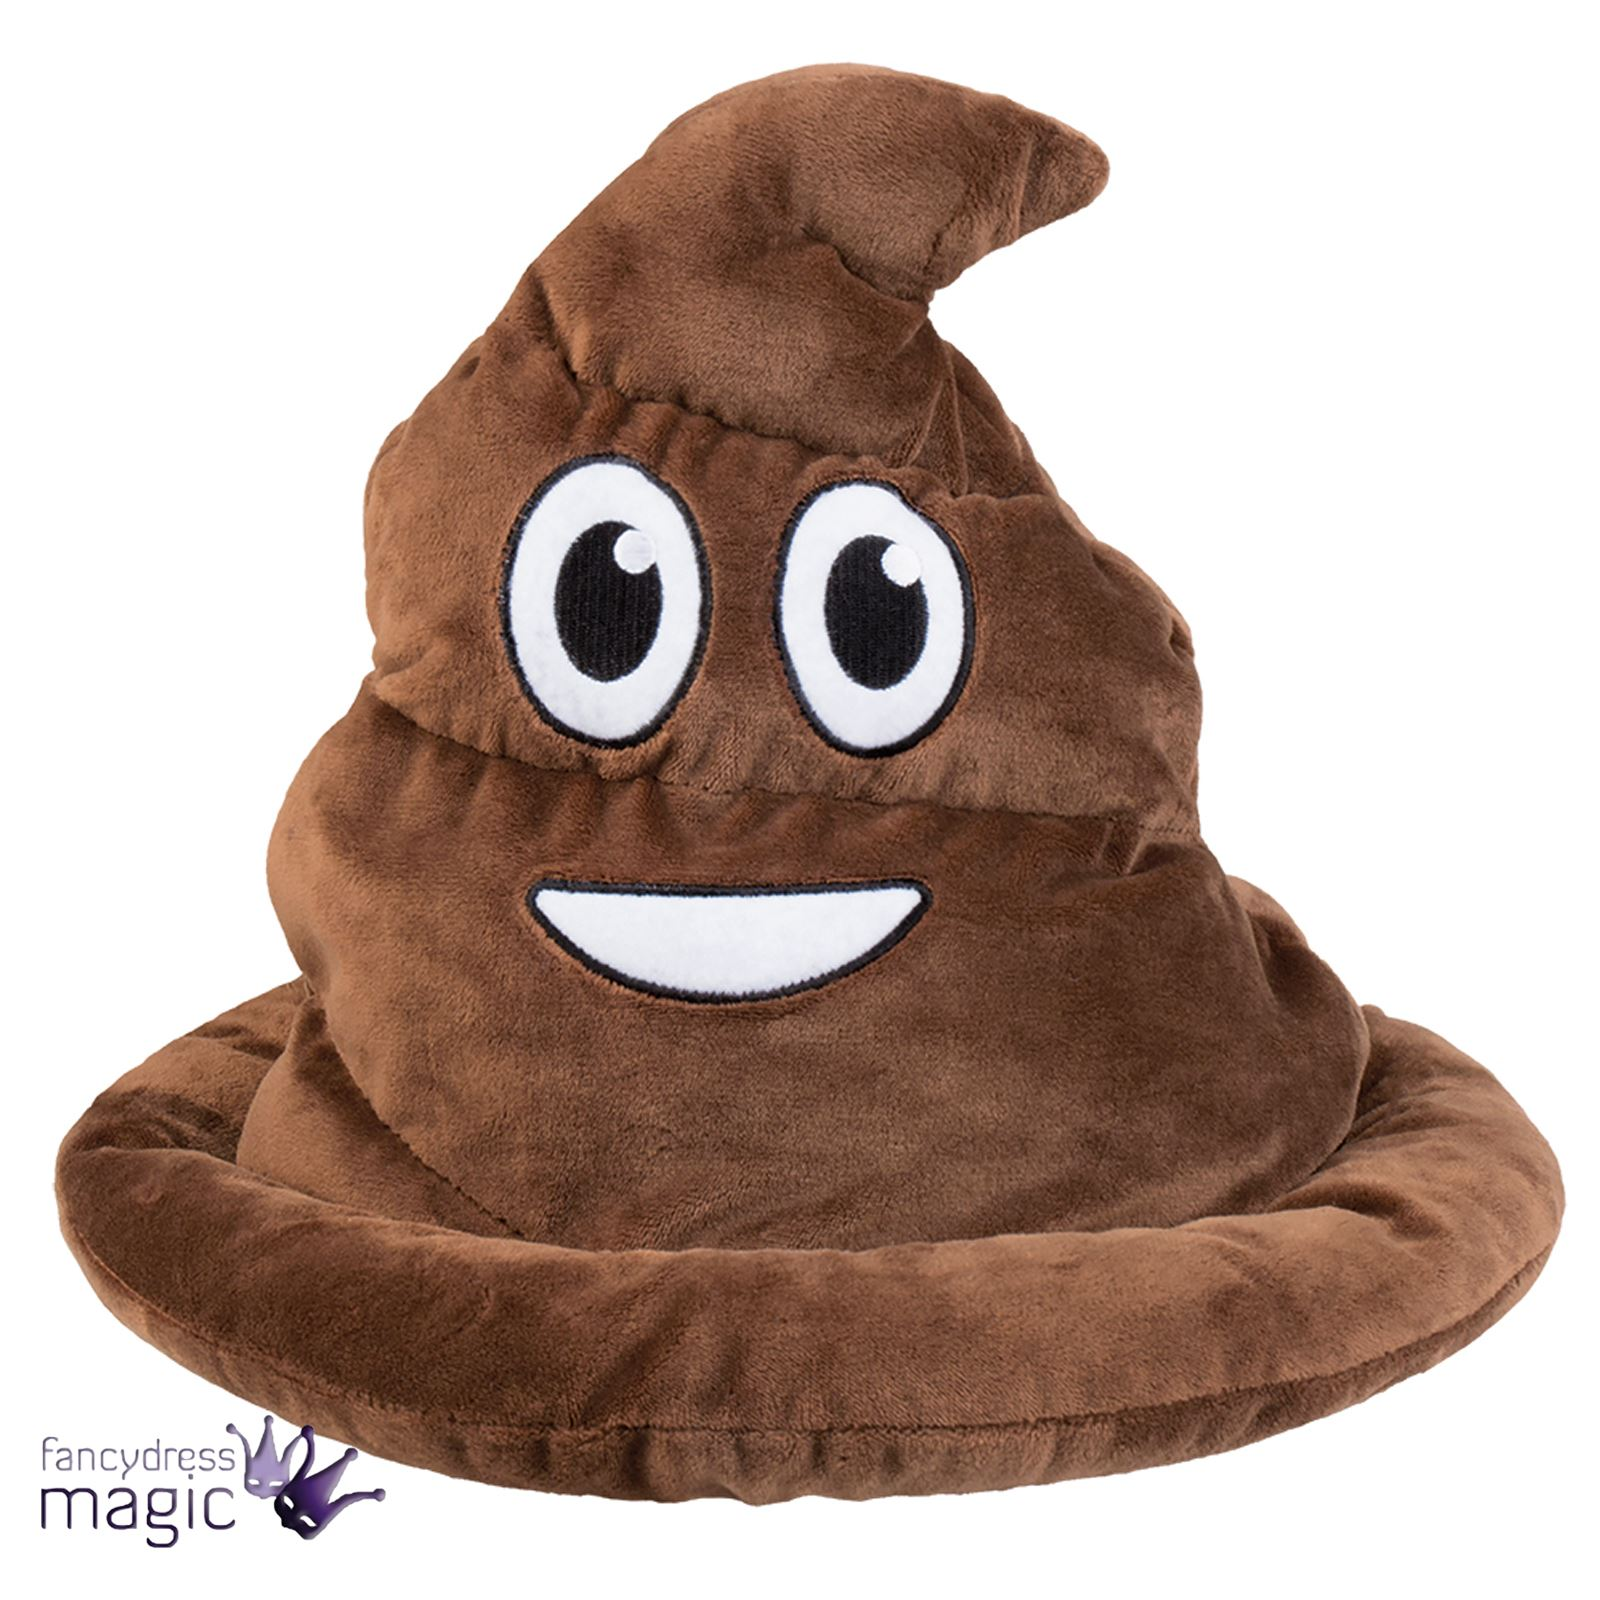 mens soft shithead pooh hat novelty fancy dress costume accessory emoji stag do 8712026042842 ebay. Black Bedroom Furniture Sets. Home Design Ideas